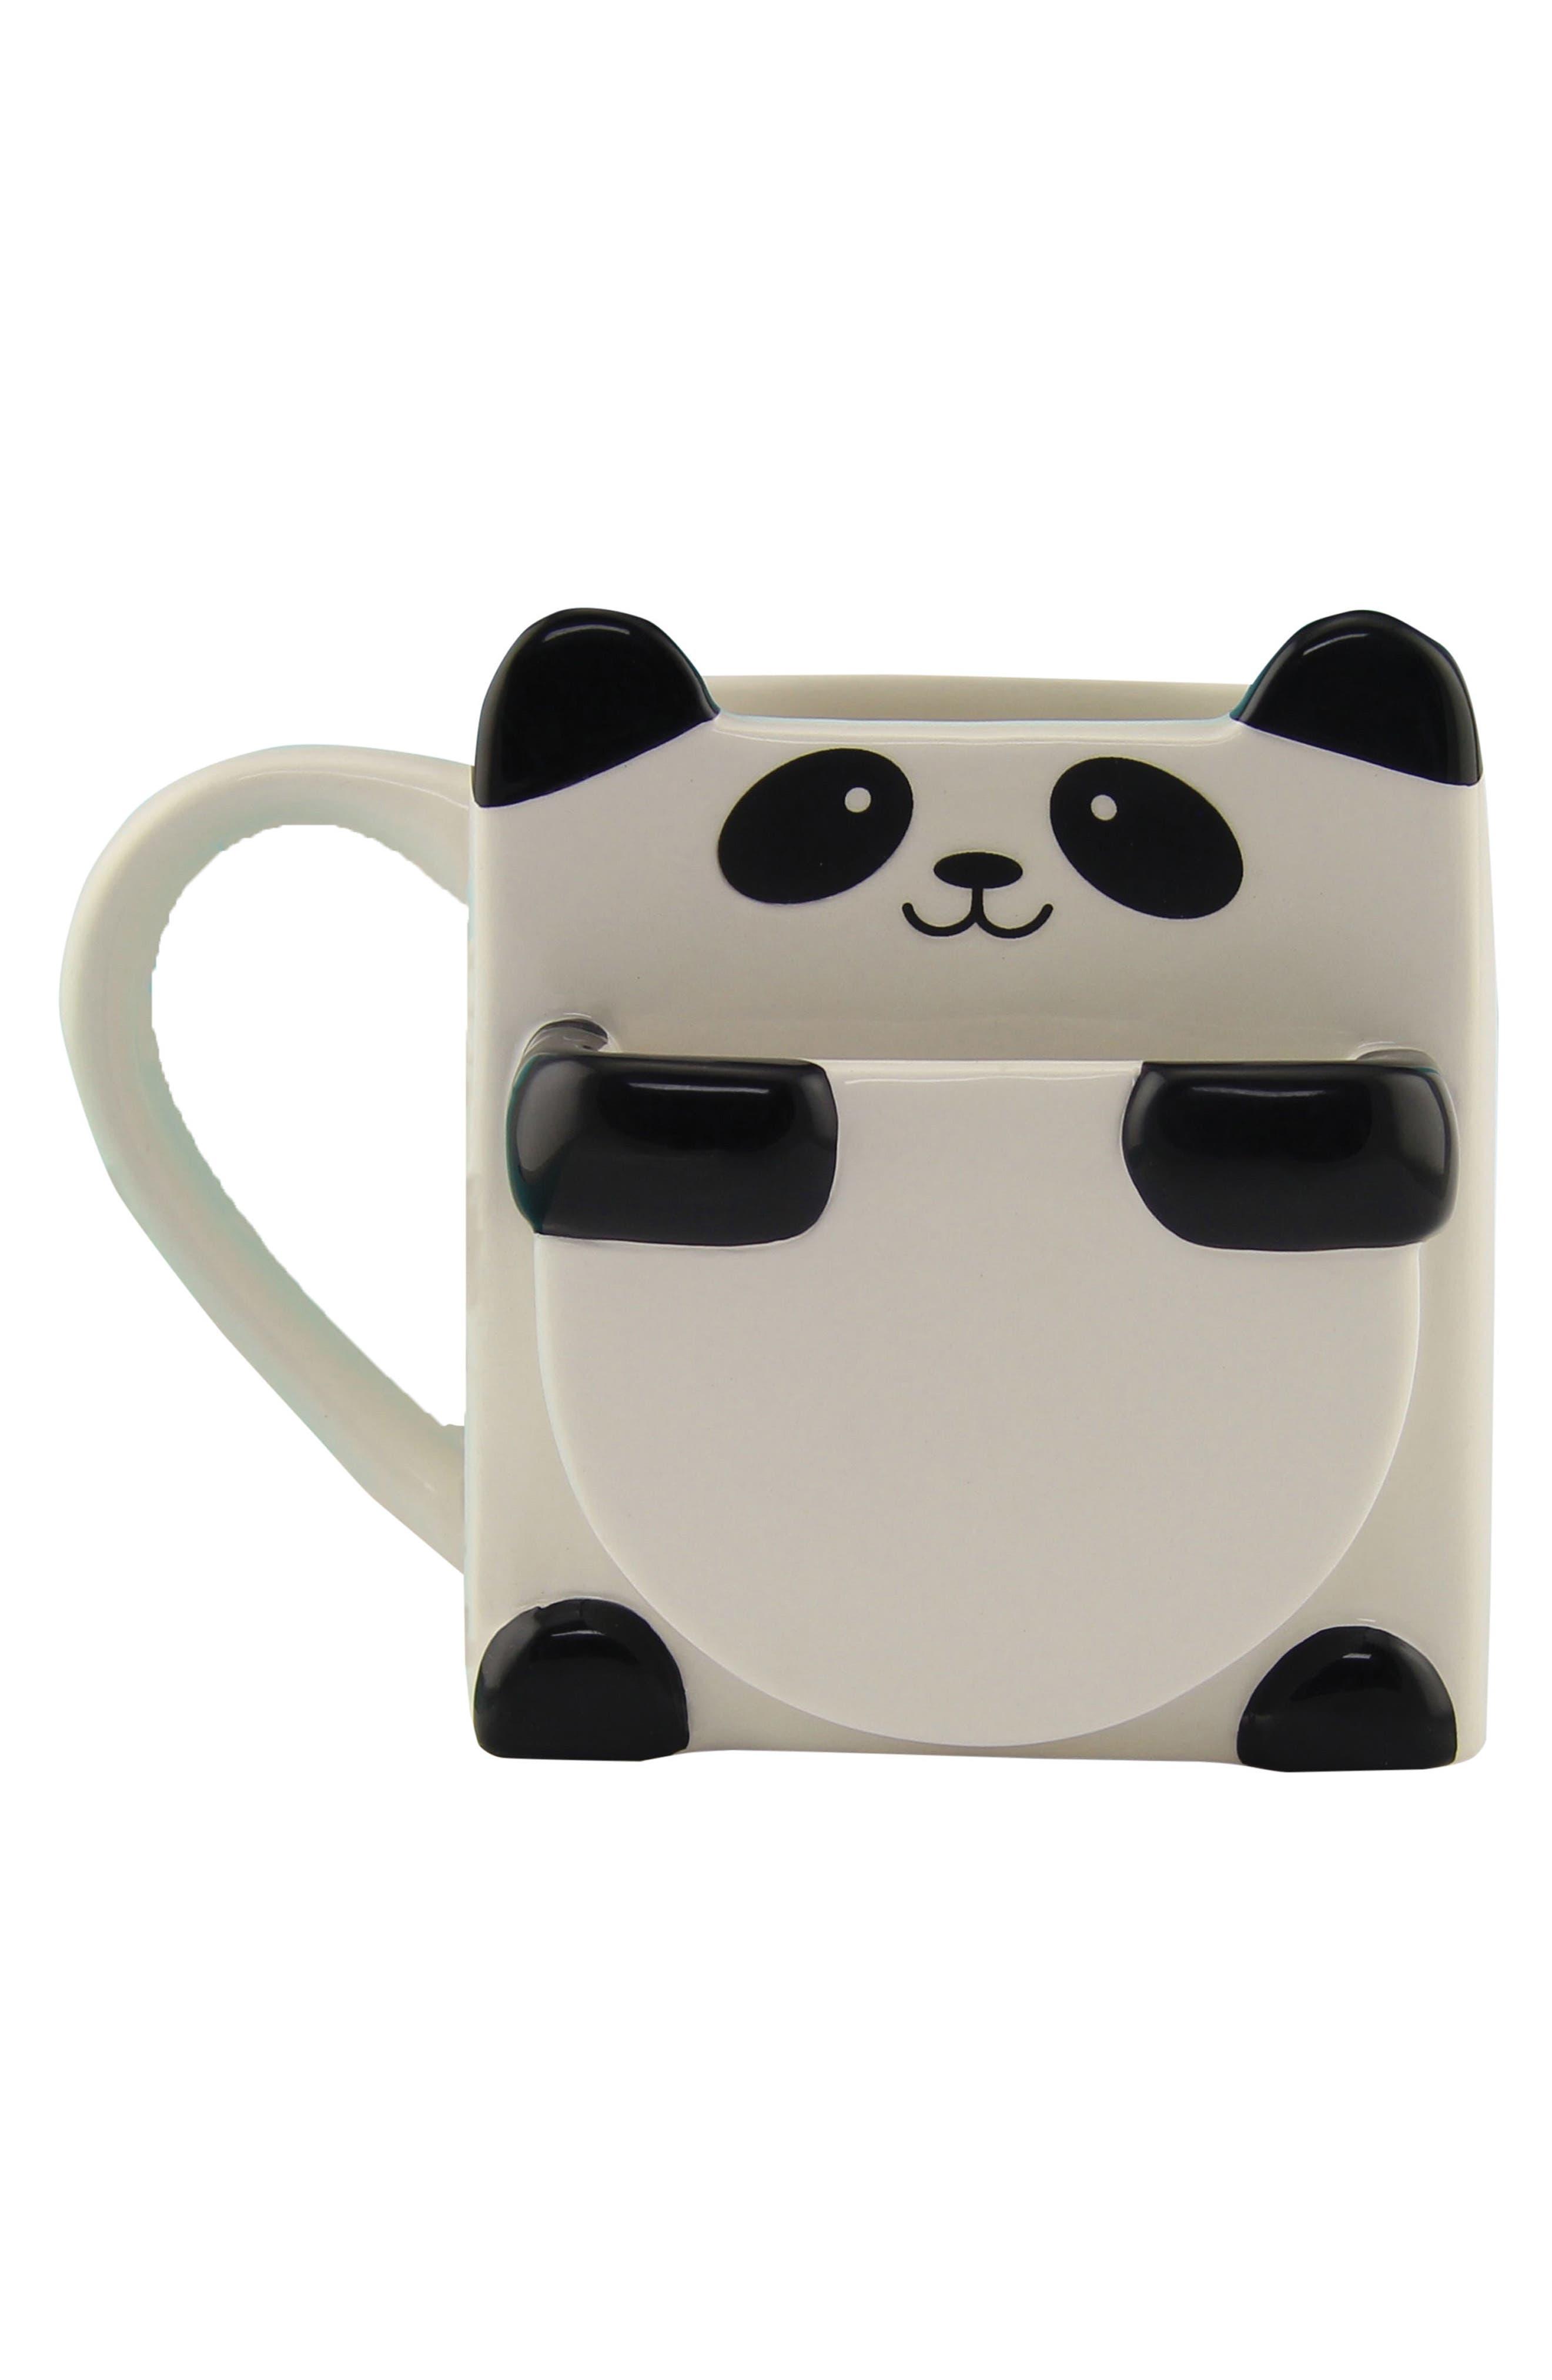 Alternate Image 1 Selected - Paladone Panda Hug Mug with Cookie Pocket